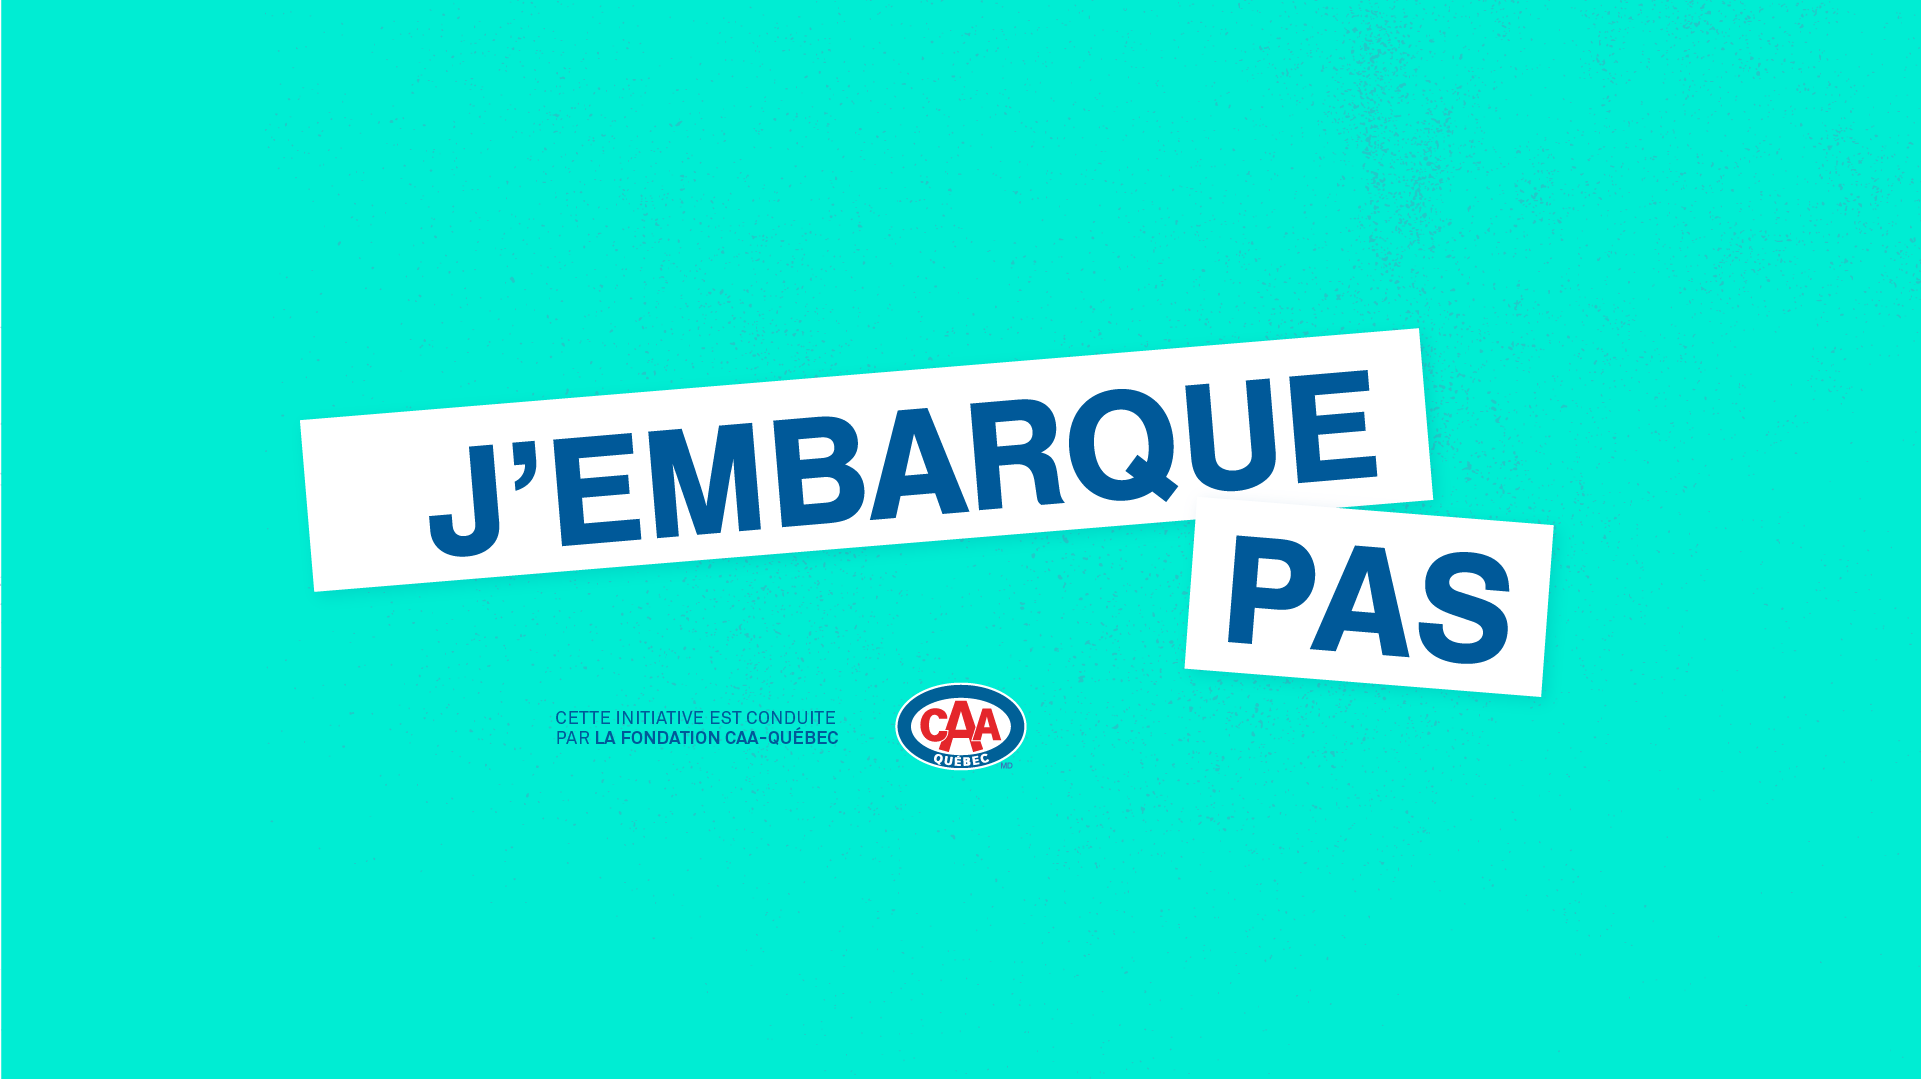 jembarque